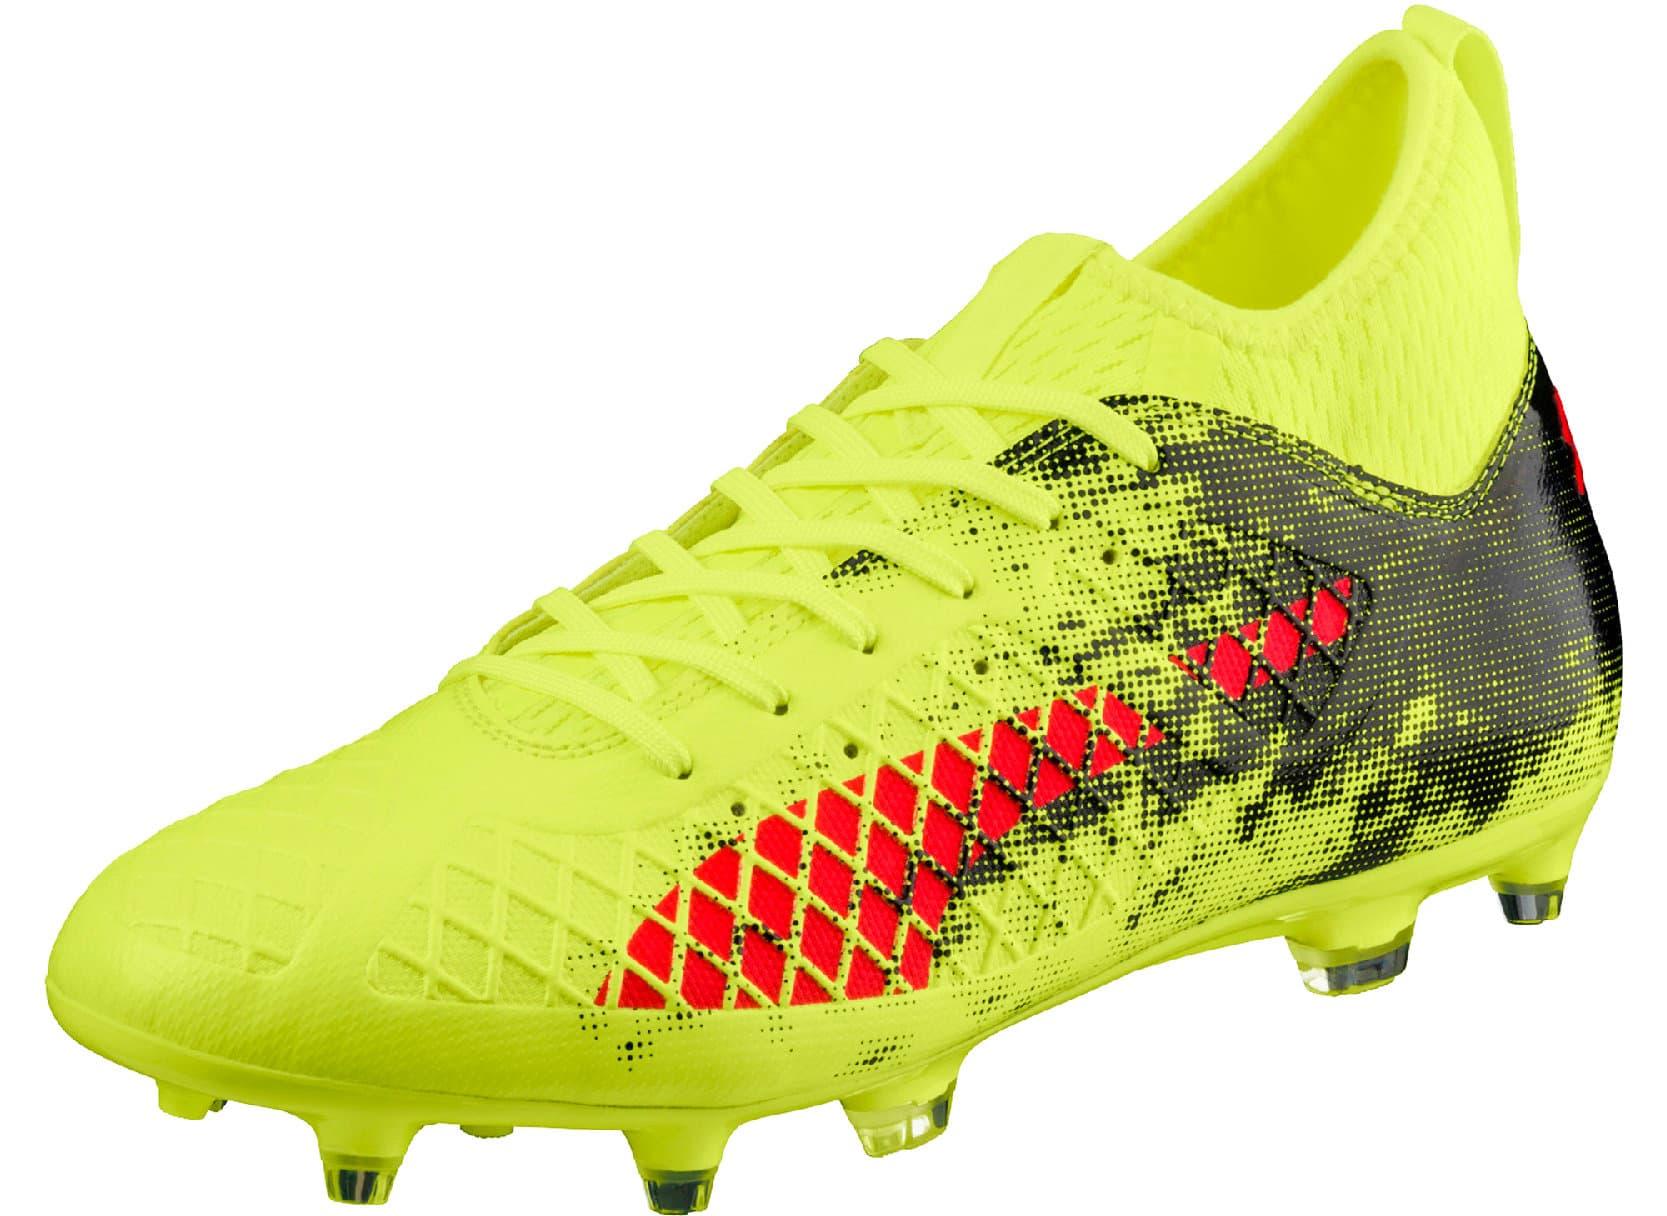 chaussure foot puma future